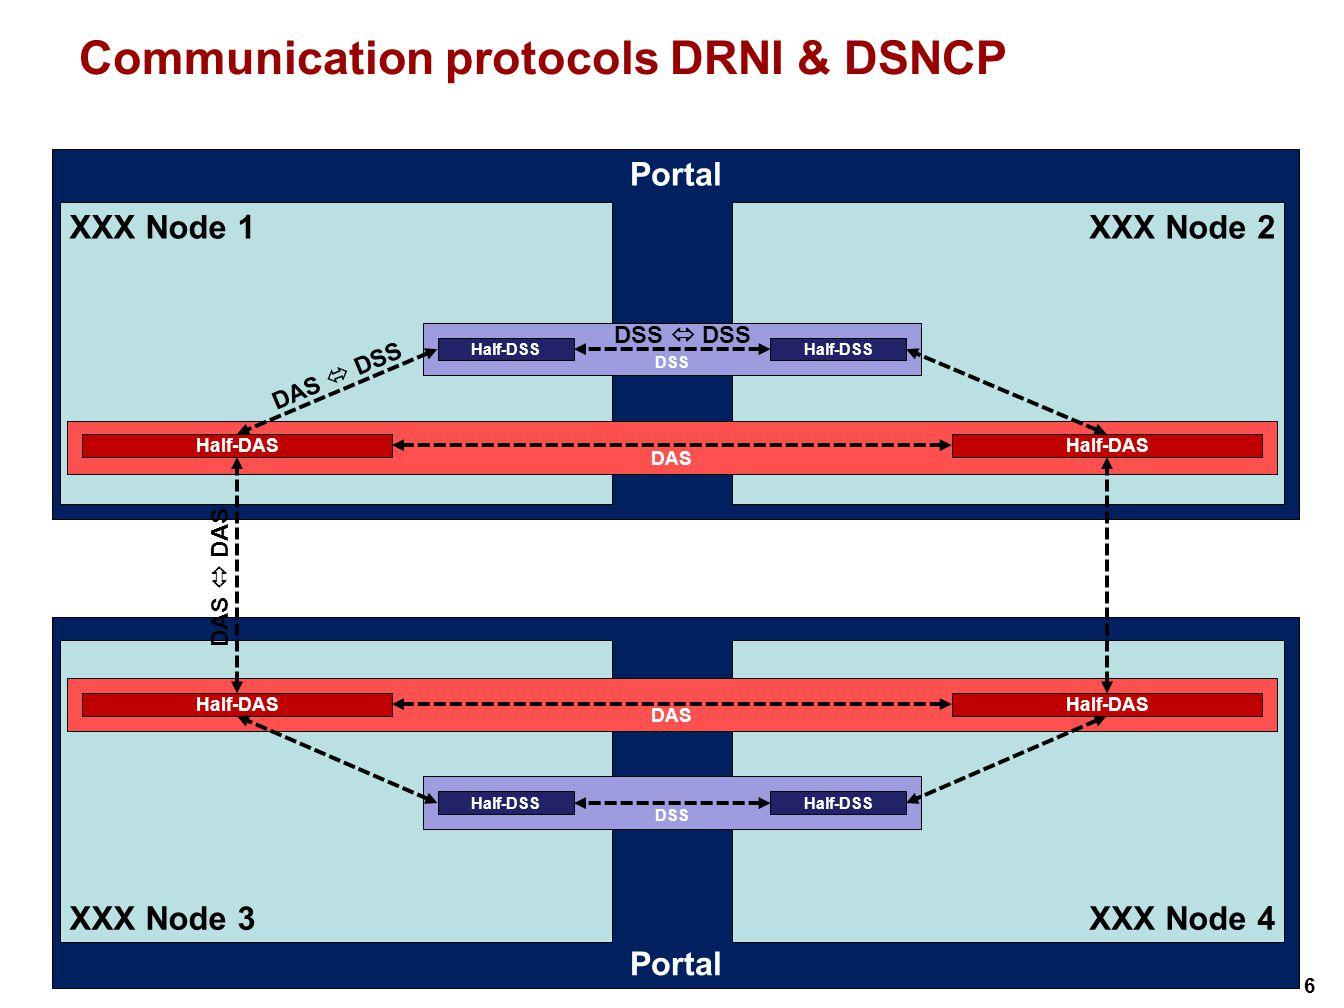 27 PBB Data Plane Model I/1 (example with BVLAN restoration) 19.2/3/5 6.9, 9.5b 8.5 19.2 6.7 802.n 19.2 6.7 802.n 19.2/3/5 6.9, 9.5b 8.5 19.2 6.7 802.n E-NNI Link 2 I-NNI Link a 19.2/3/5 6.9, 9.5b 8.5 19.2 6.7 802.n 19.2/3/5 6.9, 9.5b 8.5 19.2 6.7 802.n 19.2/3/5 6.9, 9.5b 8.5 19.2 6.7 802.n E-NNI Link 3 I-NNI Link b Half-DAS S-Relay PIP 19.2/3/5 6.9, 9.5b 8.5 19.2 6.7 802.3 Half-DAS S-Relay 19.2/3/5 6.9, 9.5b 8.5 19.2 6.7 802.3 E-NNI Link 1 19.2/3/5 6.9, 9.5b 8.5 19.2 6.7 802.3 19.2/3/5 6.9, 9.5b 8.5 19.2 6.7 802.3 E-NNI Link 4 6.14 6.10 6.14 6.11, 9.5c 19.2/3/5 6.14 6.10 6.14 6.11, 9.5c 19.2/3/5 PNP 6.14 6.10 6.14 6.11, 9.5c 19.2/3/5 6.14 6.10 6.14 6.11, 9.5c 19.2/3/5 6.14 6.10 6.14 6.11, 9.5c 19.2/3/5 B-Relay 19.2/3/5 6.9, 9.5b 8.5 19.2/3/5 6.9, 9.5b 8.5 19.2/3/5 6.9, 9.5b 8.5 19.2/3/5 6.9, 9.5b 8.5 19.2/3/5 6.9, 9.5b 8.5 19.2/3/5 6.9, 9.5b 8.5 CBP PNP Network Virtual Link Intra-DAS Virtual Link Intra-DSS Virtual Link Intra-DAS Link 19.2/3/5 6.9, 9.5b 8.5 6.14 6.10 6.14 6.11, 9.5c 19.2/3/5 BVLAN MEP Link MEP EC NO MEP EC E-NNI MEP EC SP MIP EC NO MIP Link MEP Network Link Intra-DVS Link Half-DVS DVS: Distributed VLAN restoration Sublayer